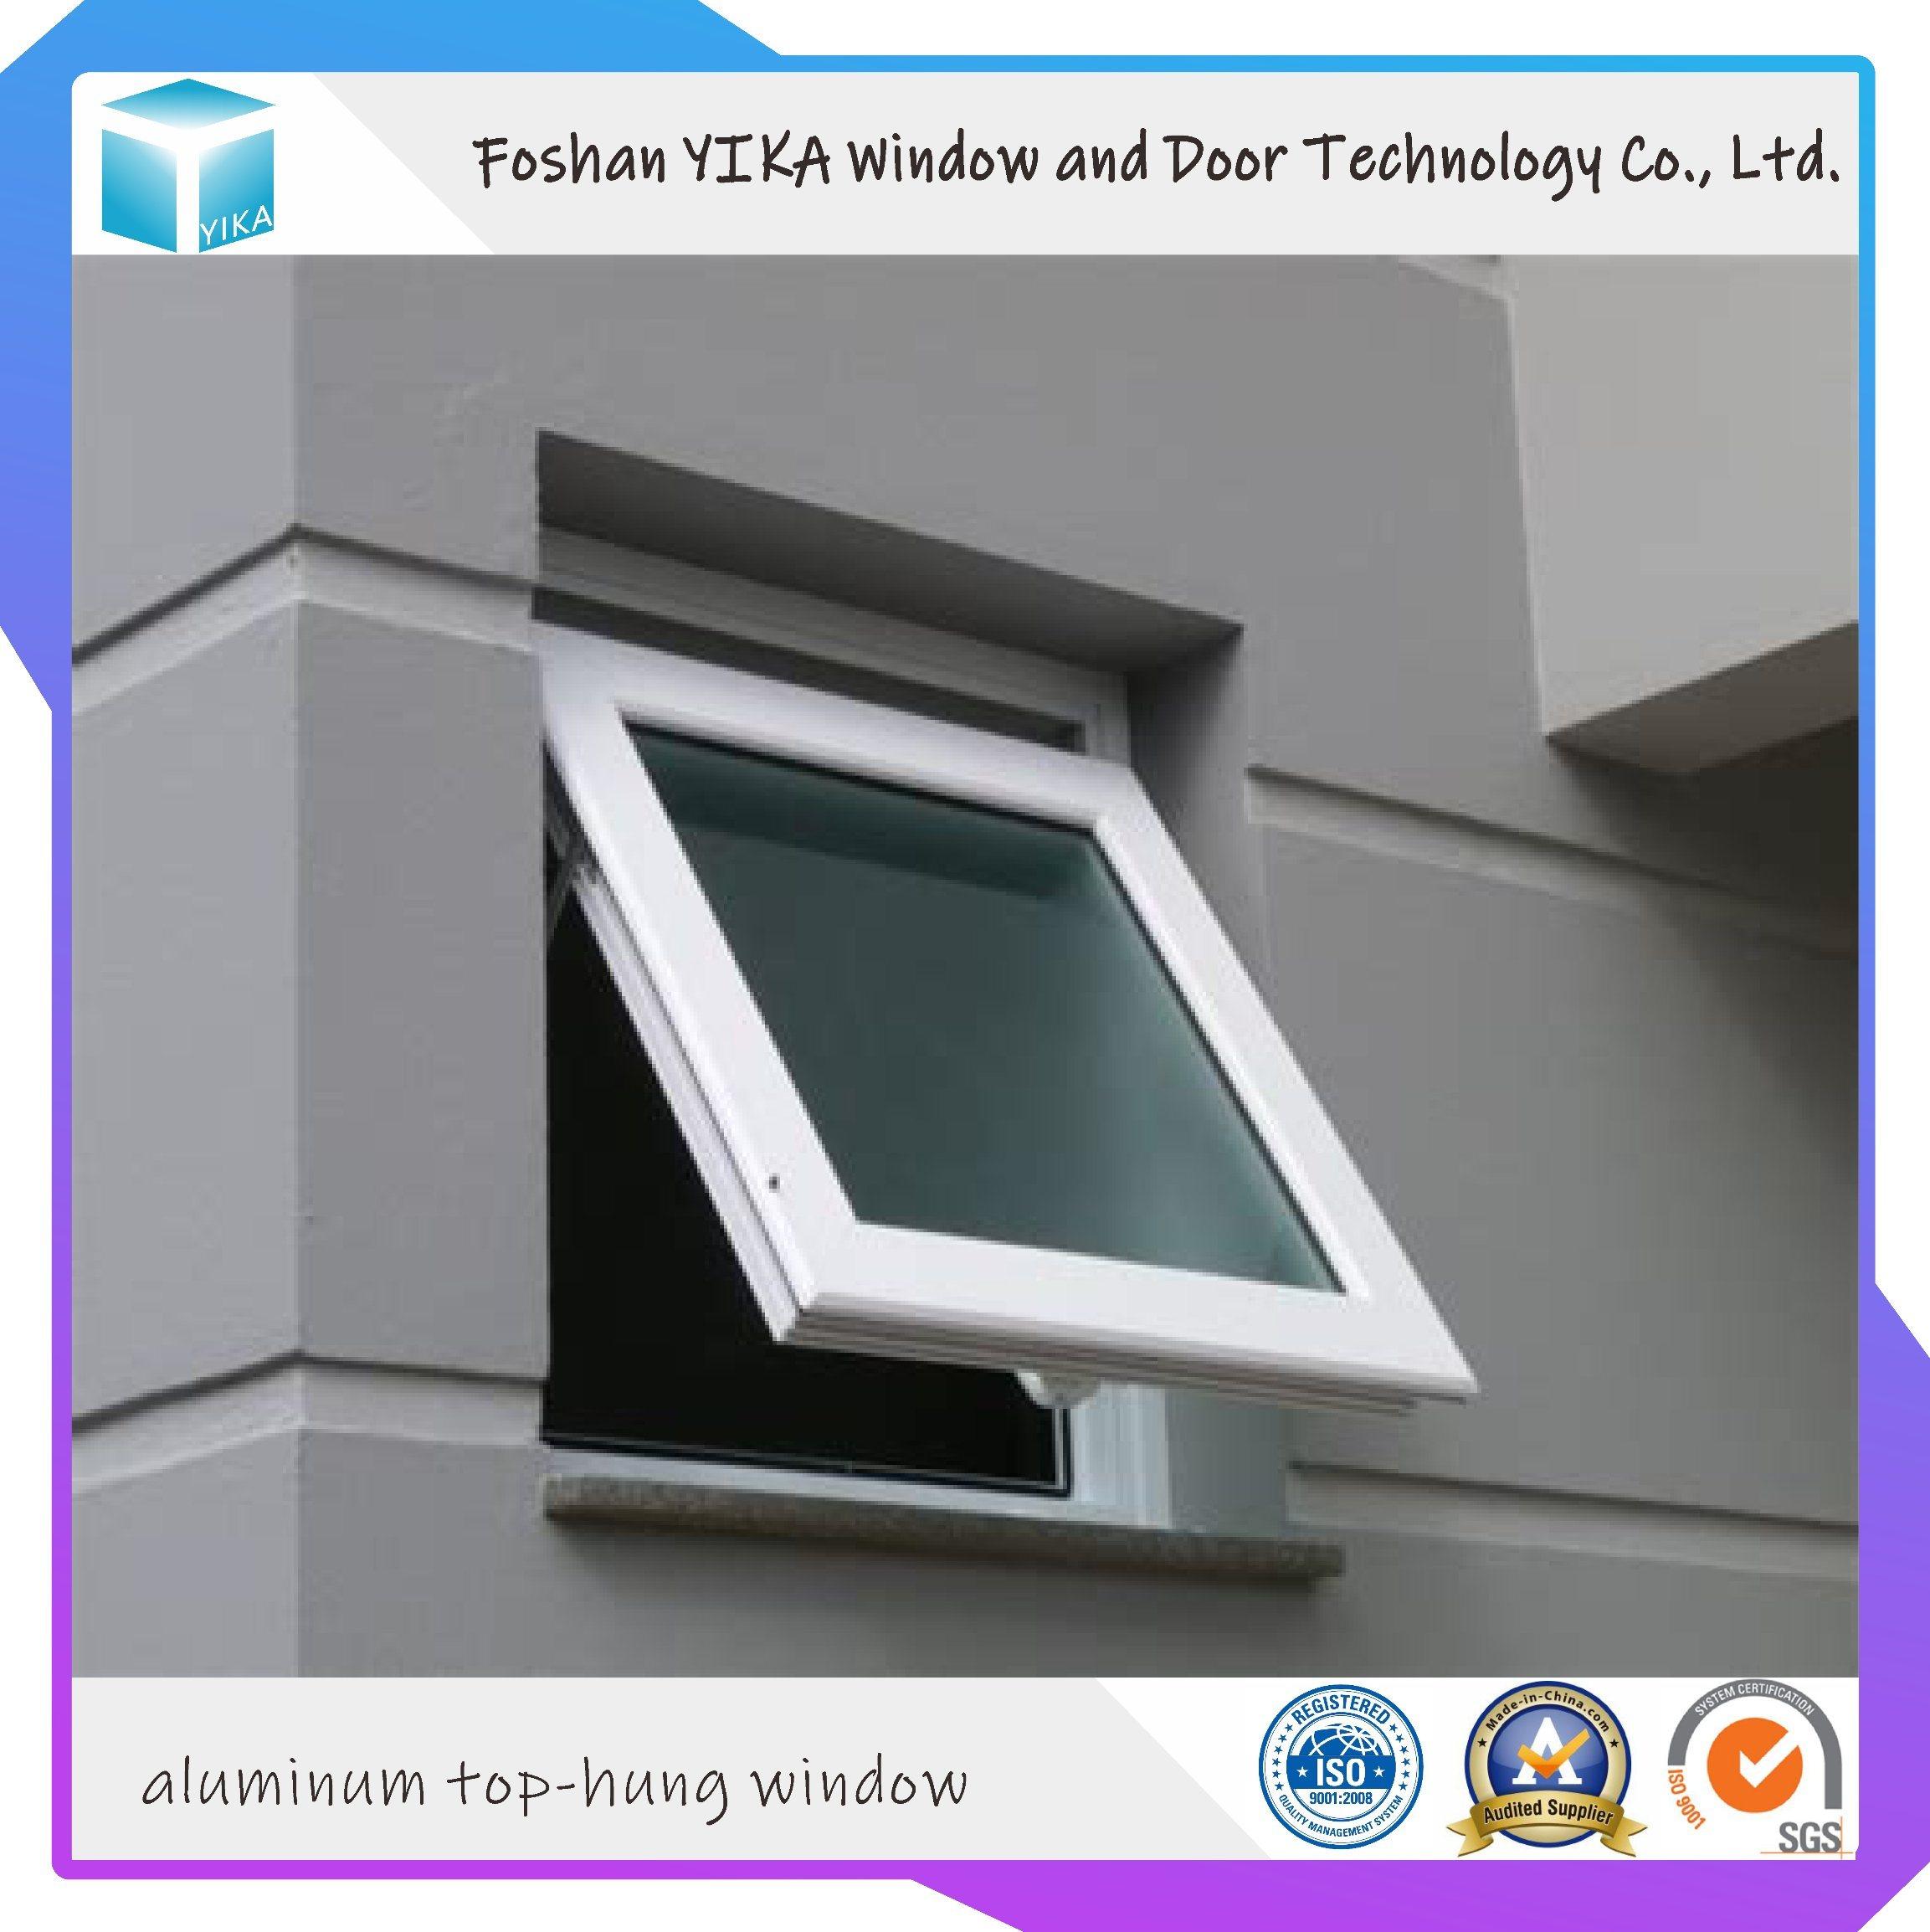 China Awing Aluminium Window Bathroom Toilet Small Windows China Top Hung Window Awning Window